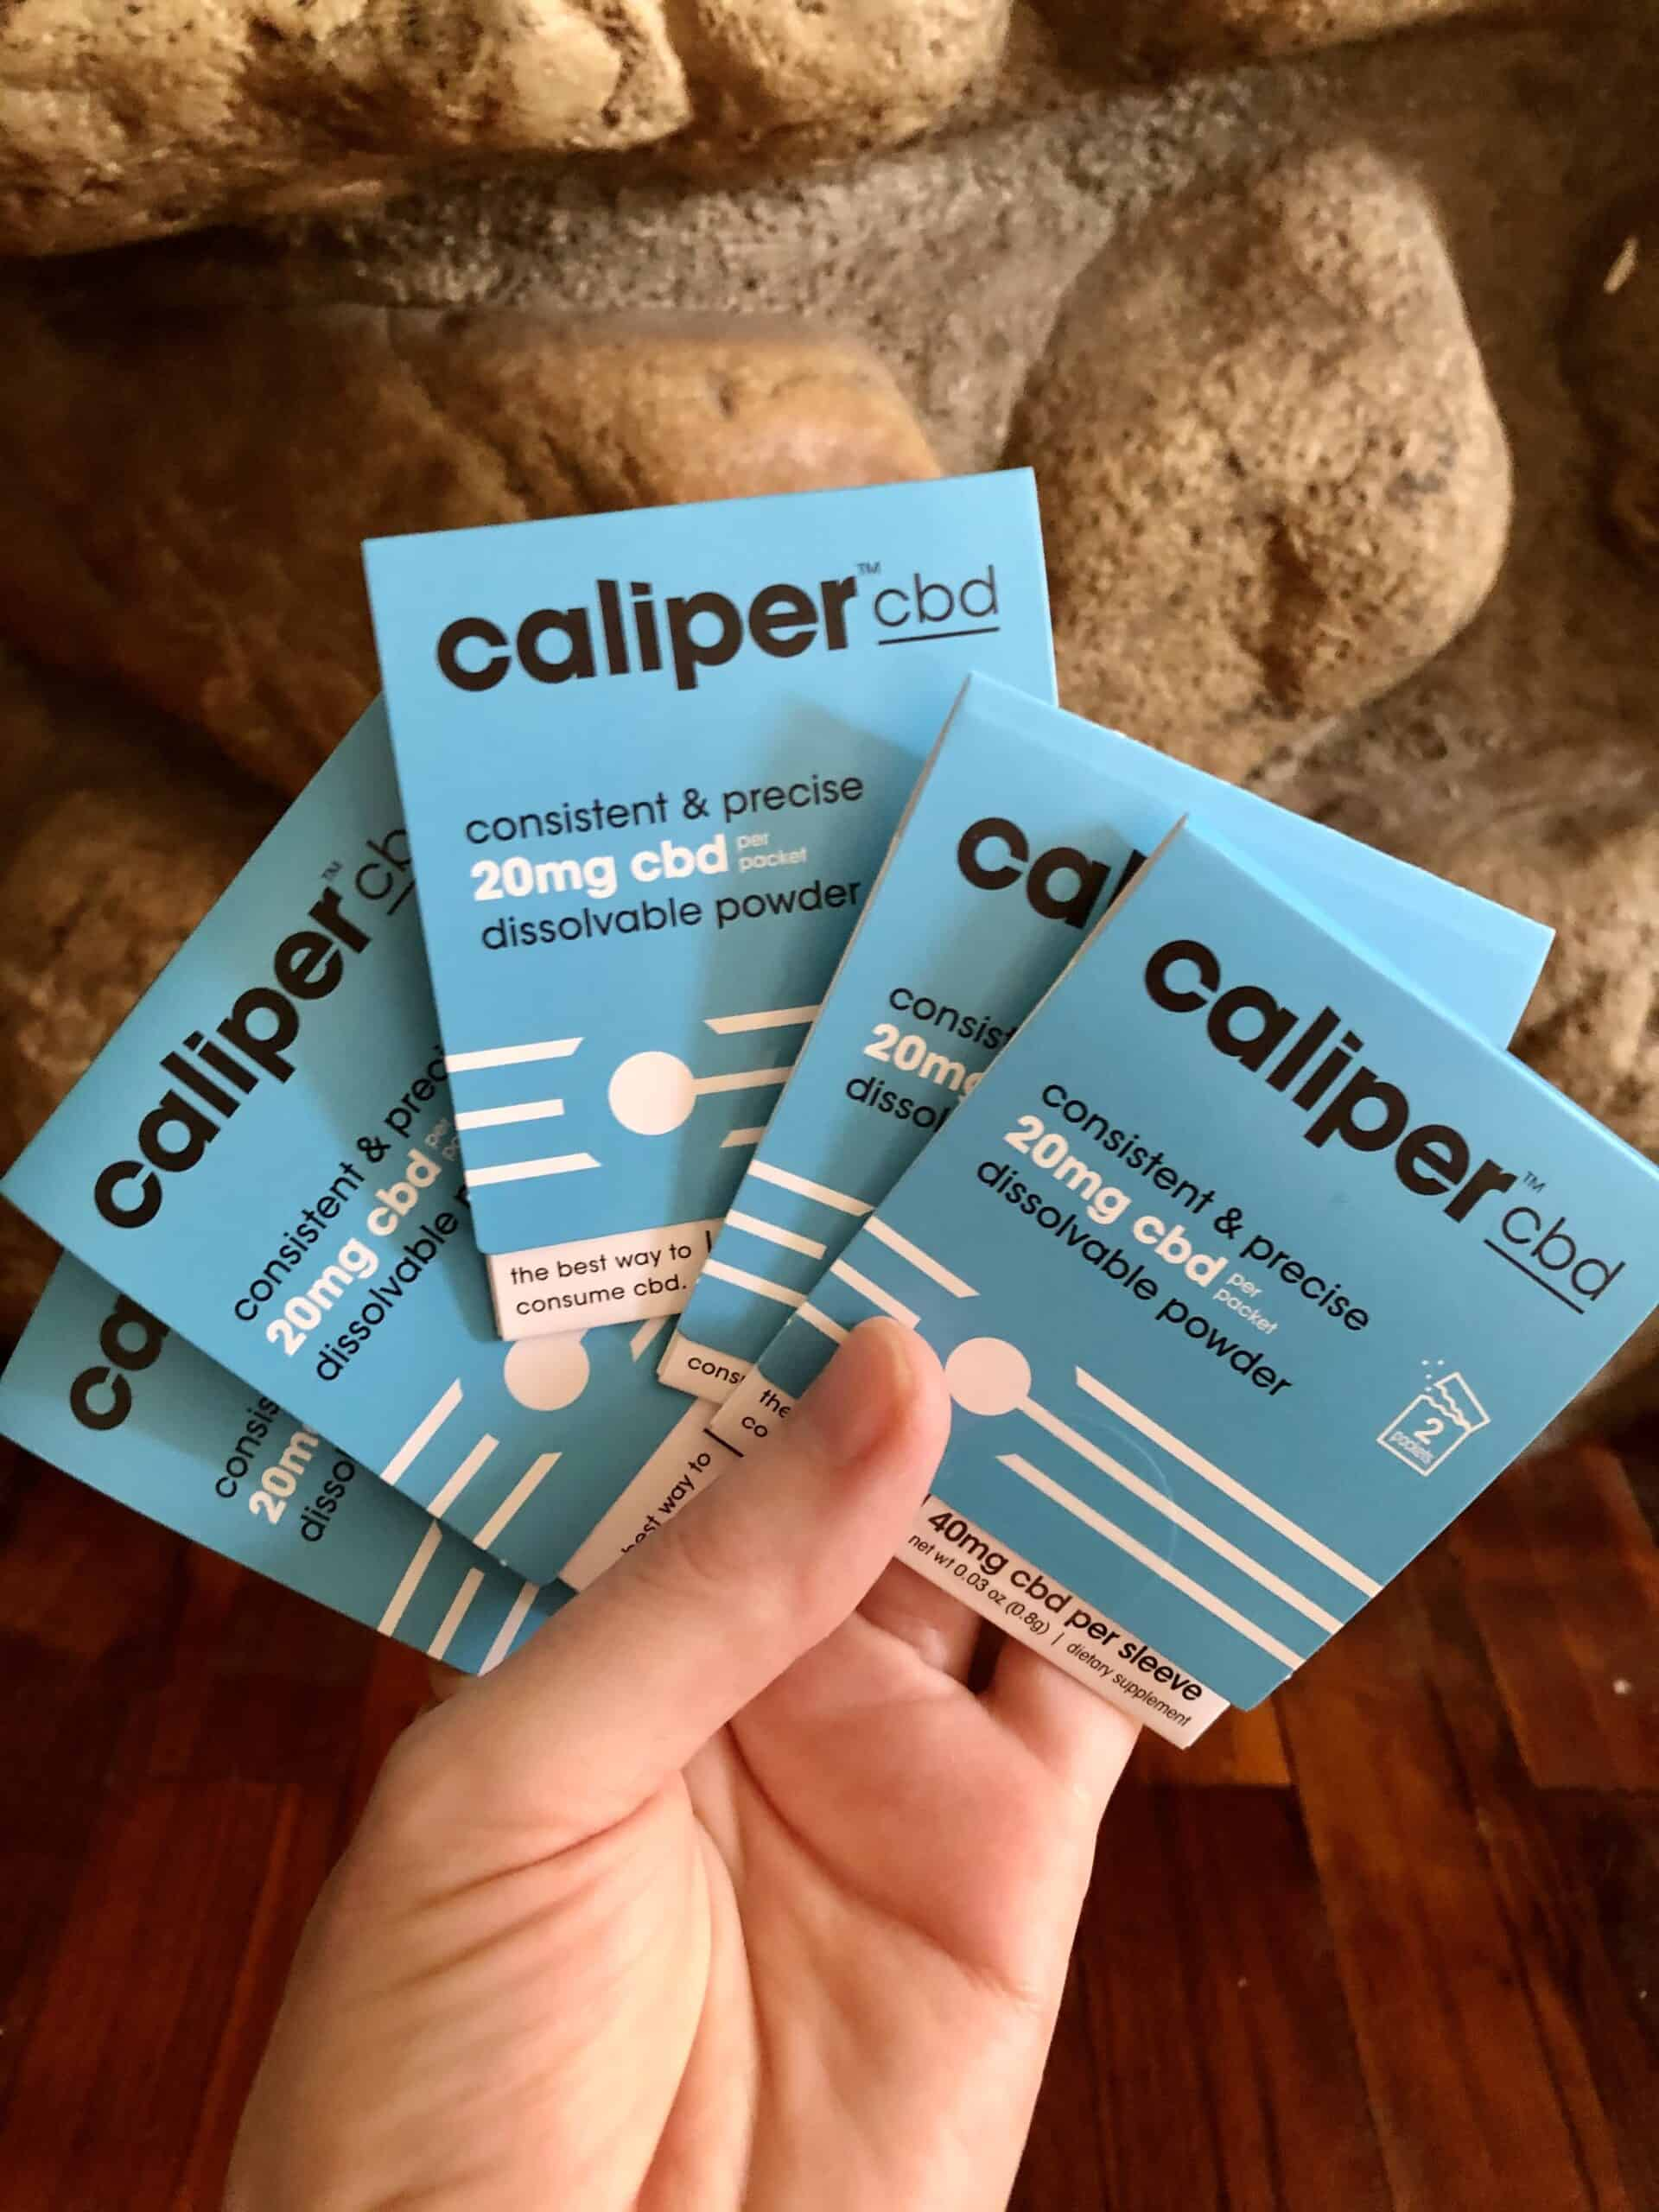 Caliper CBD Dissolvable Powder Save On Cannabis Review Beauty Shot